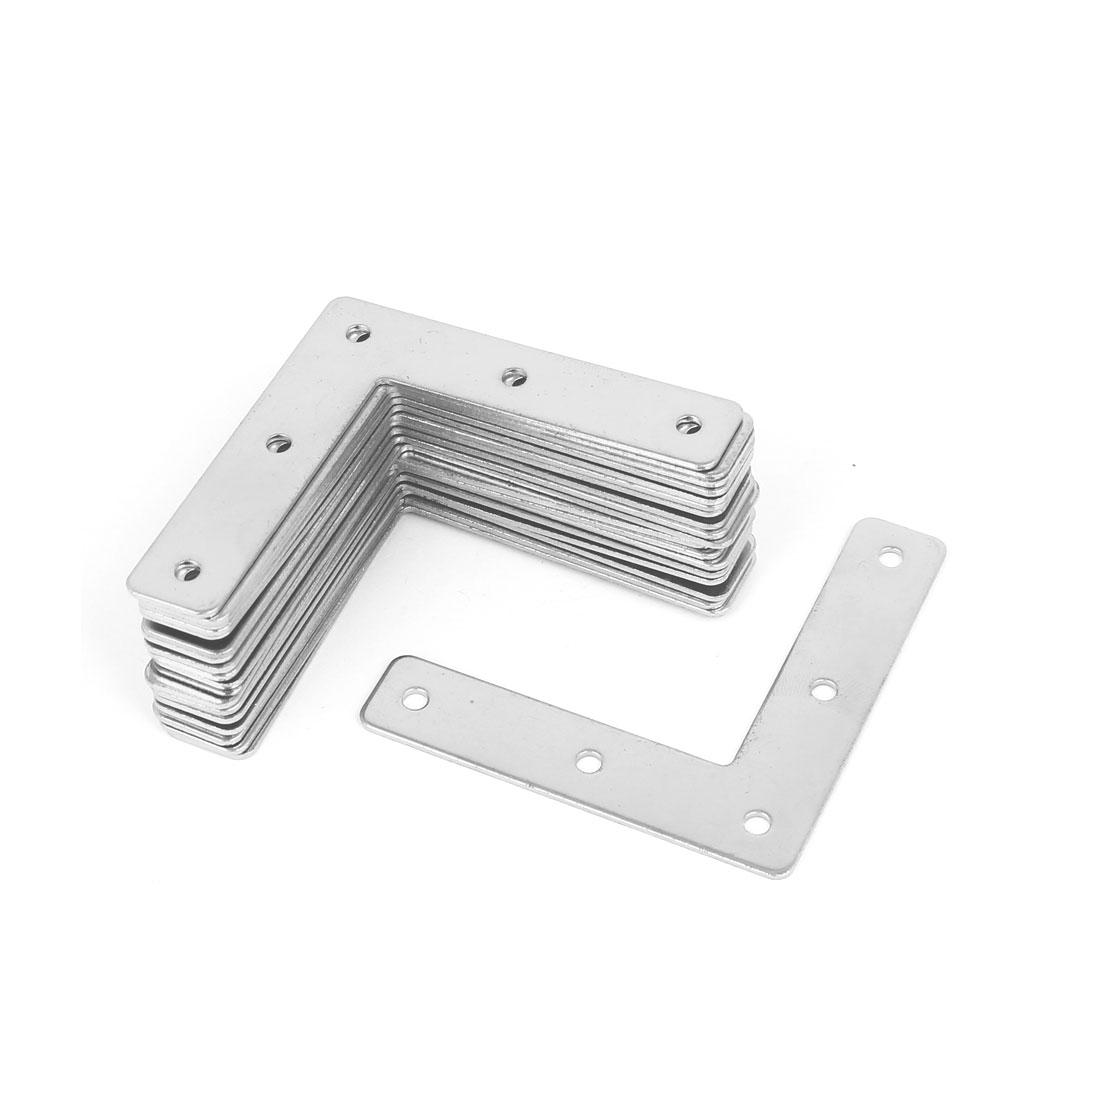 73mmx73mmx1.5mm L Shape Angle Bracket Corner Brace Flat Repair Plate 20pcs